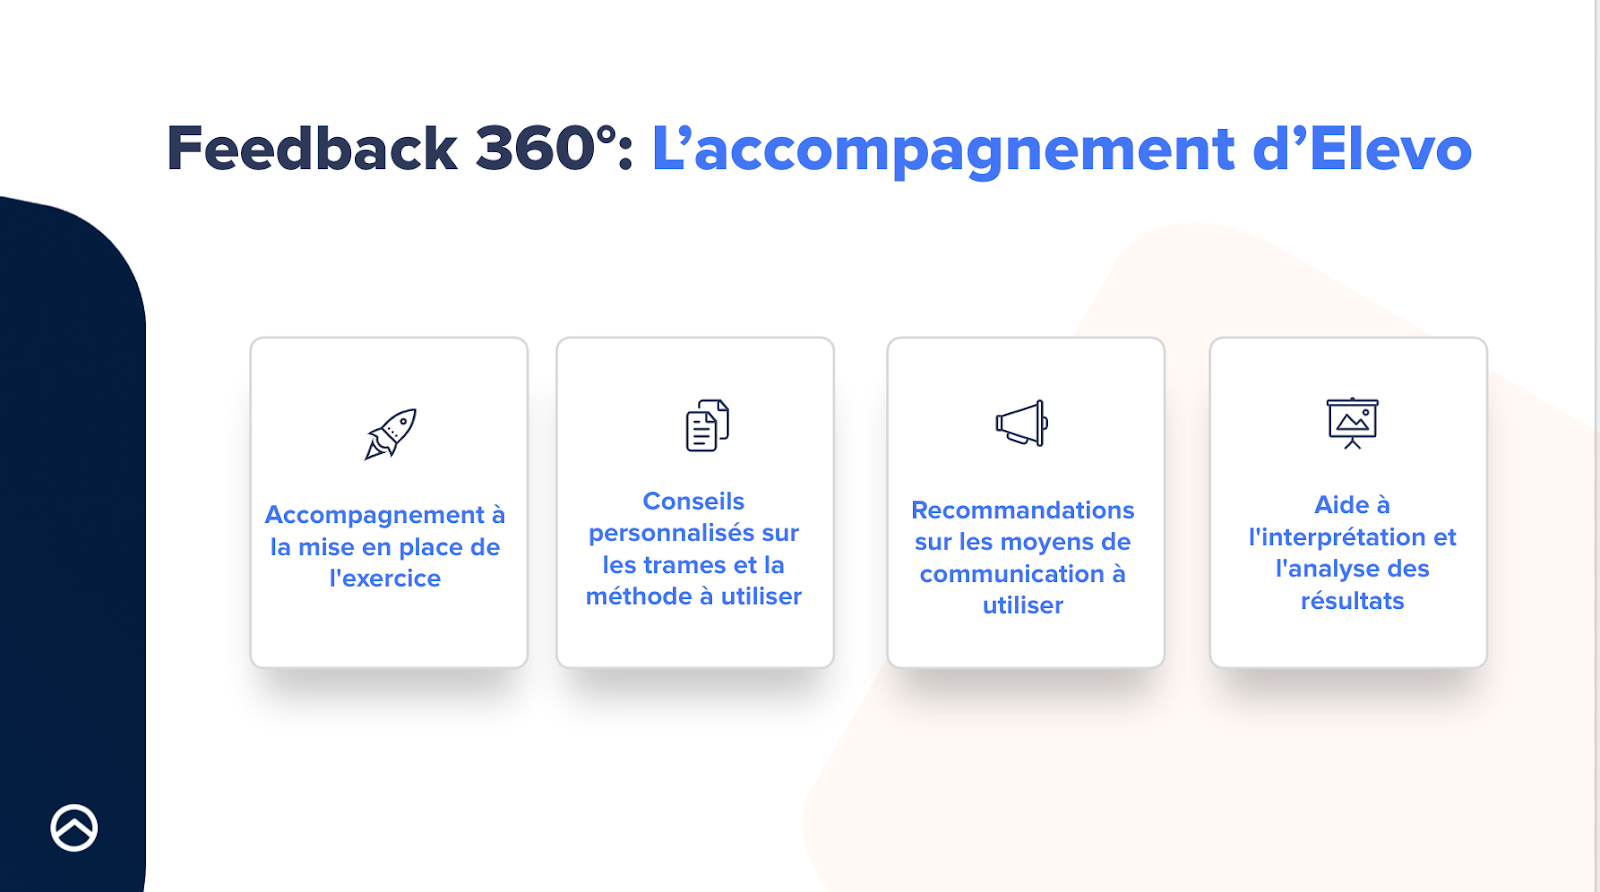 L'accompagnement d'Elevo sur la pratique du Feedback 360°